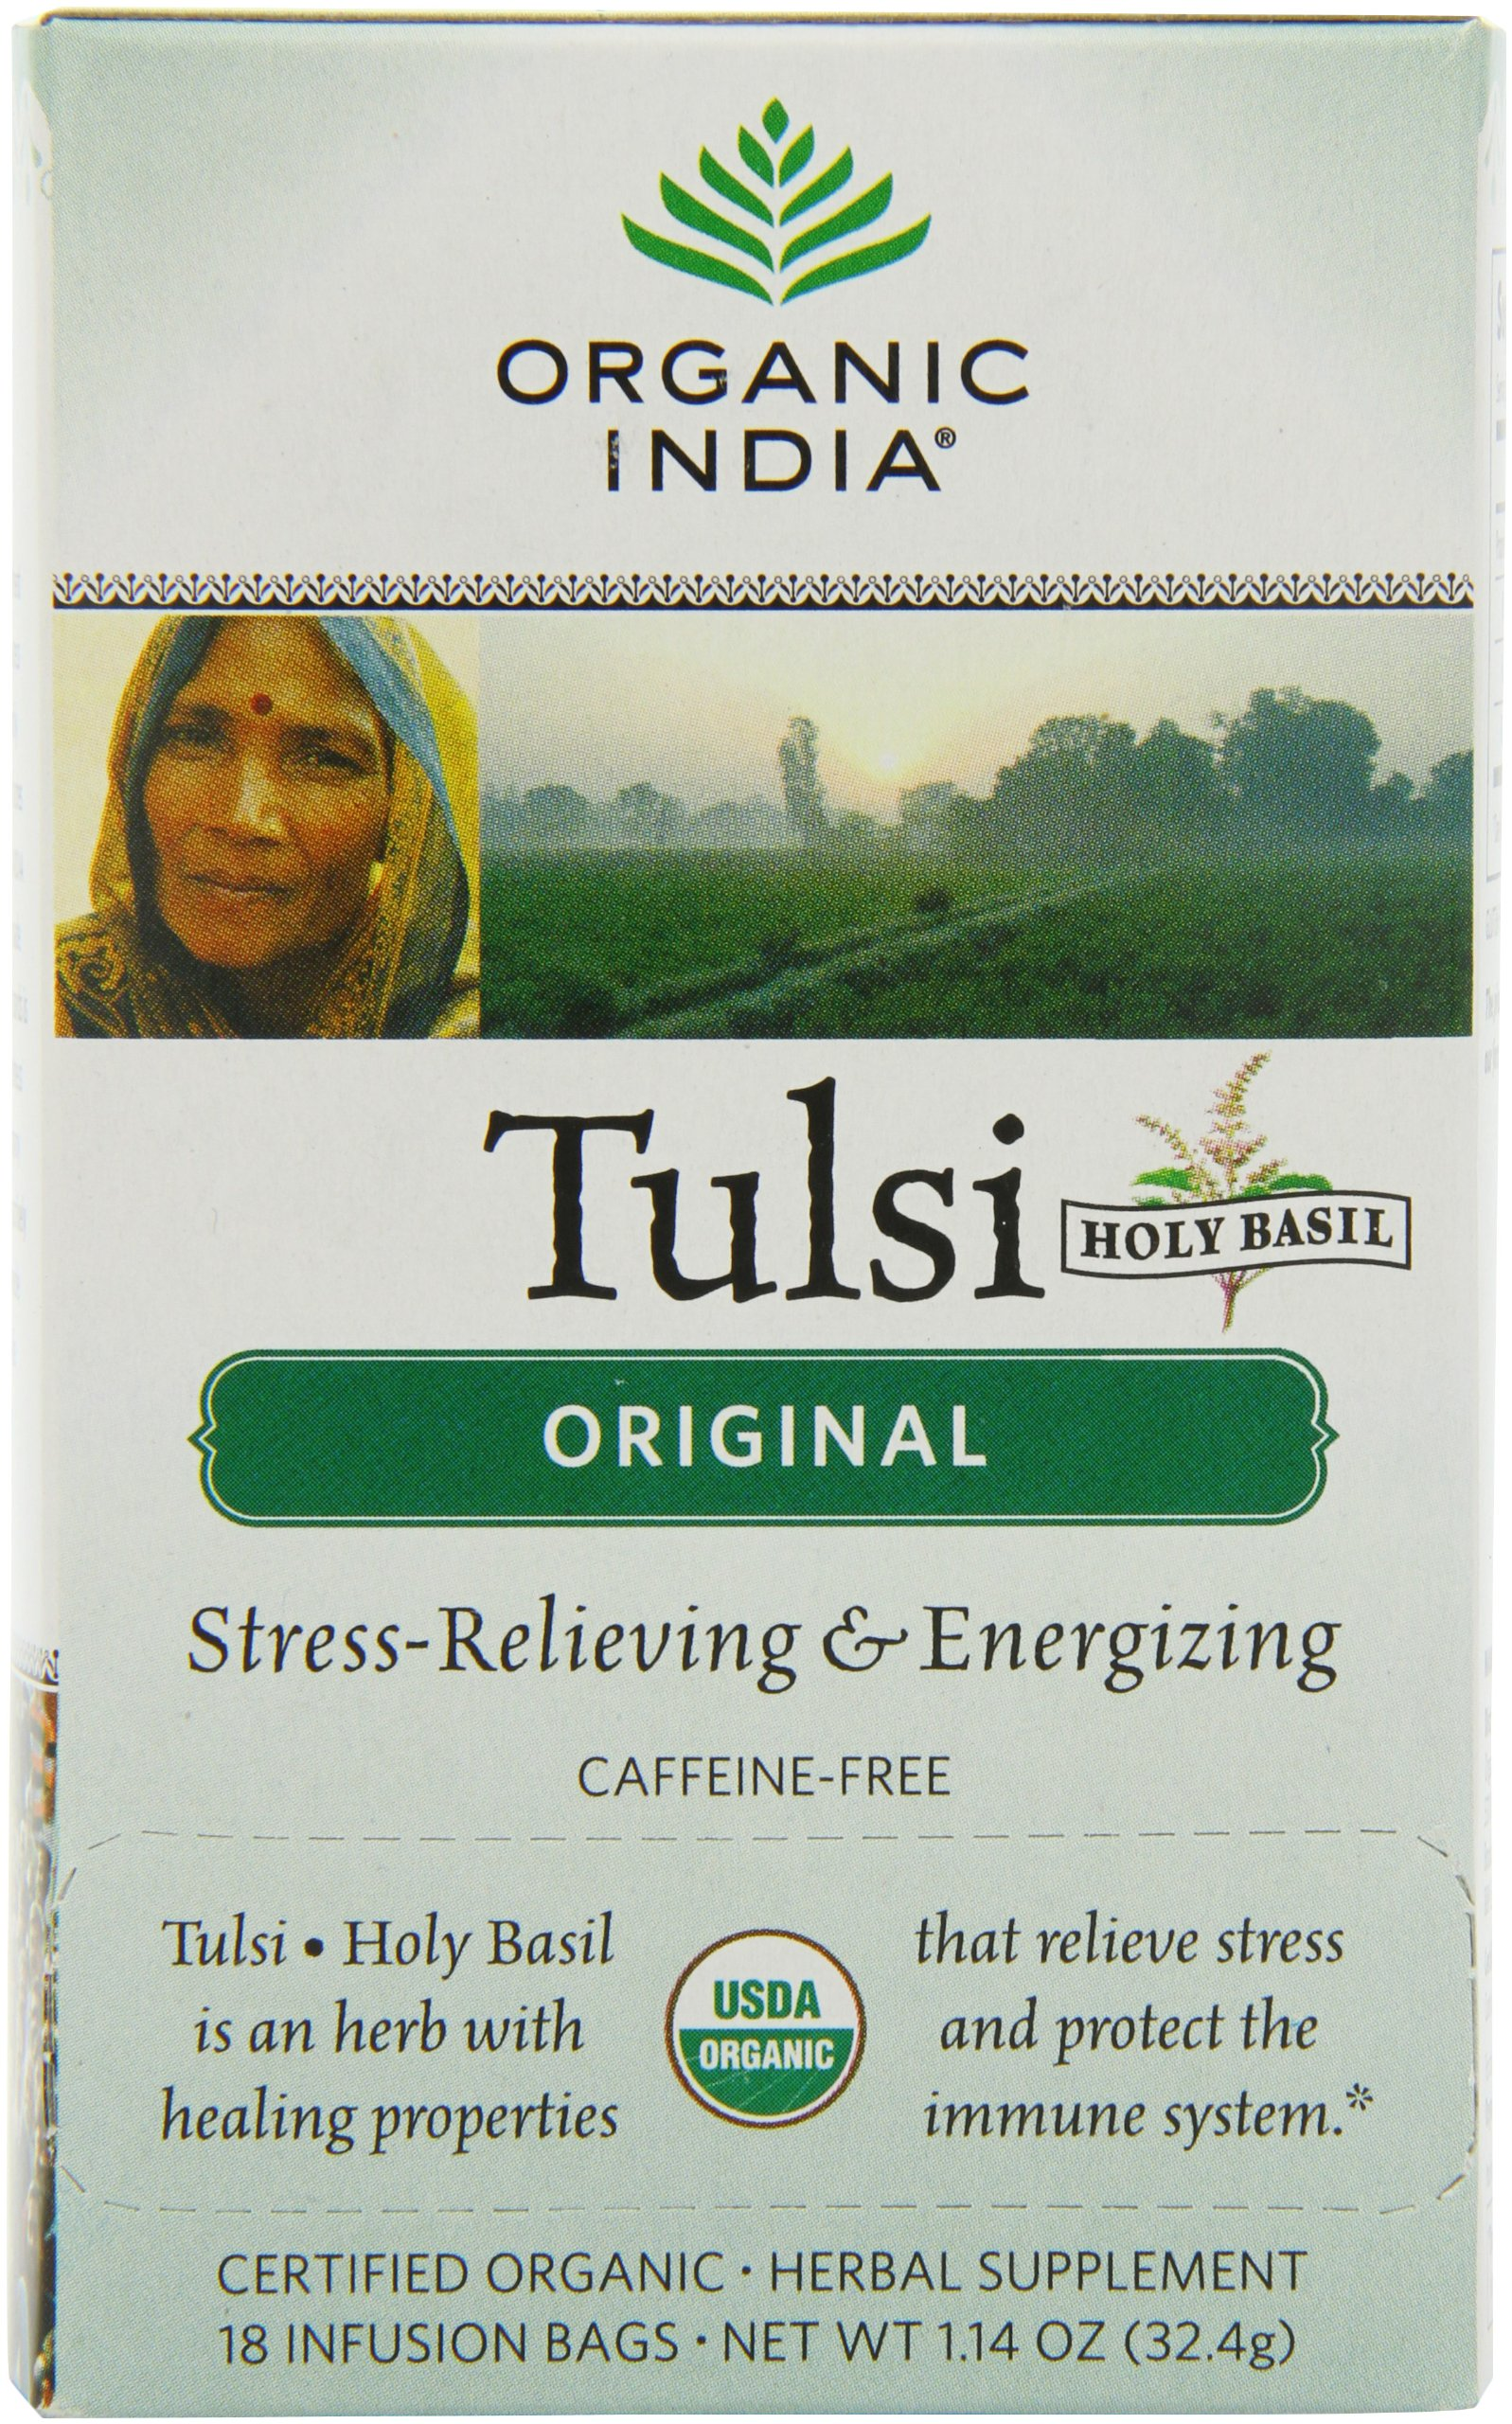 Organic India: Tulsi Original, 18 bags (2 pack)